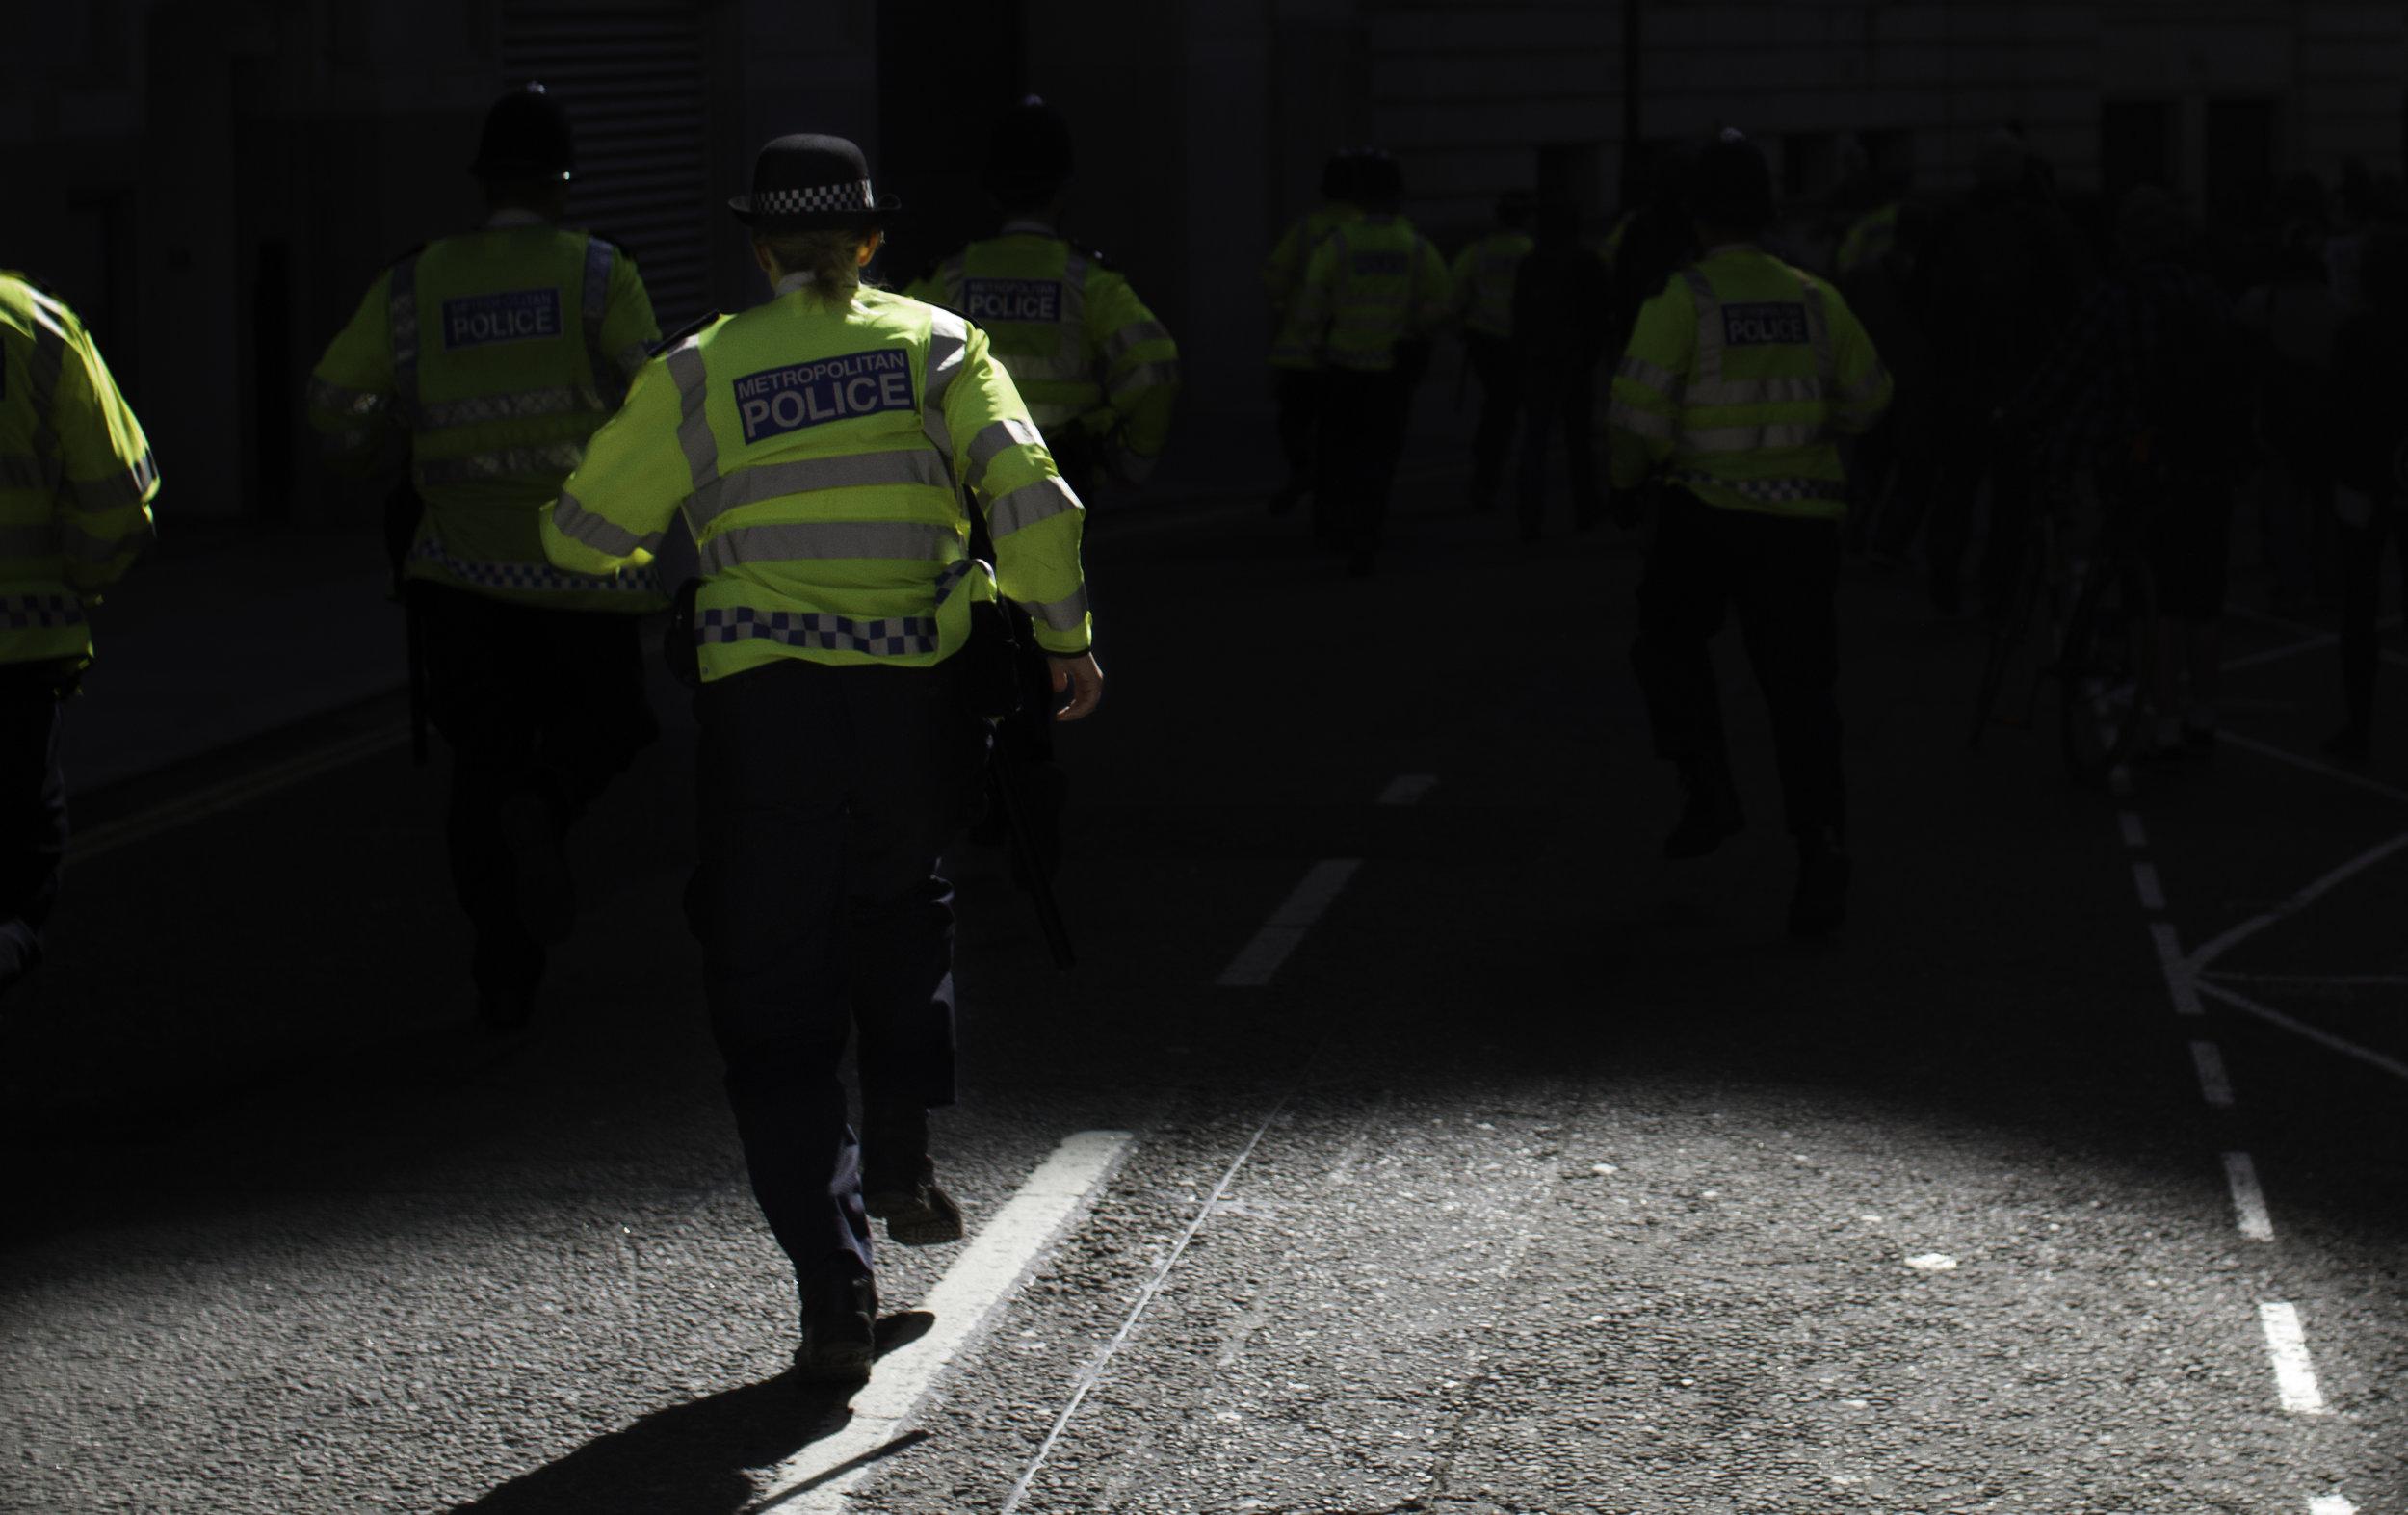 Police Run.jpg